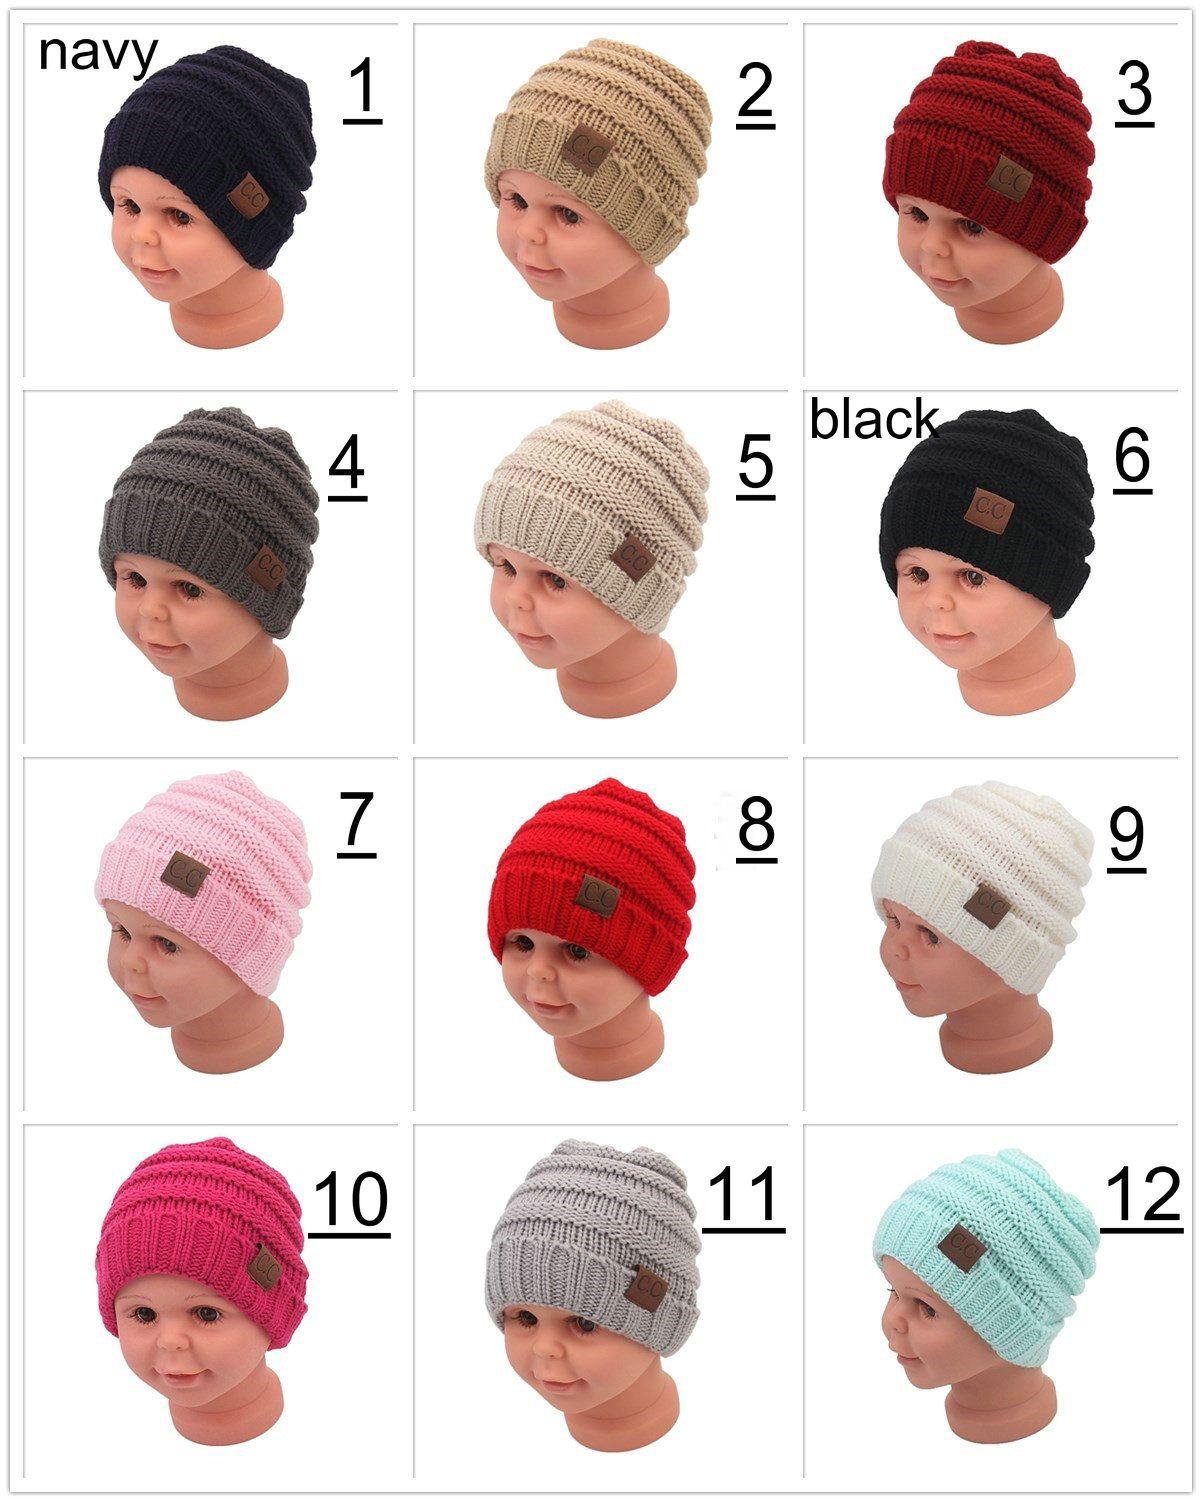 aaafc103 2019 Wholesale Fashion Baby Hats CC Trendy Beanie Crochet Beanies Hat  Winter Newborn Beanie Children Wool Knitted Beanie Cap From Sdknitting,  $1.9 | DHgate.